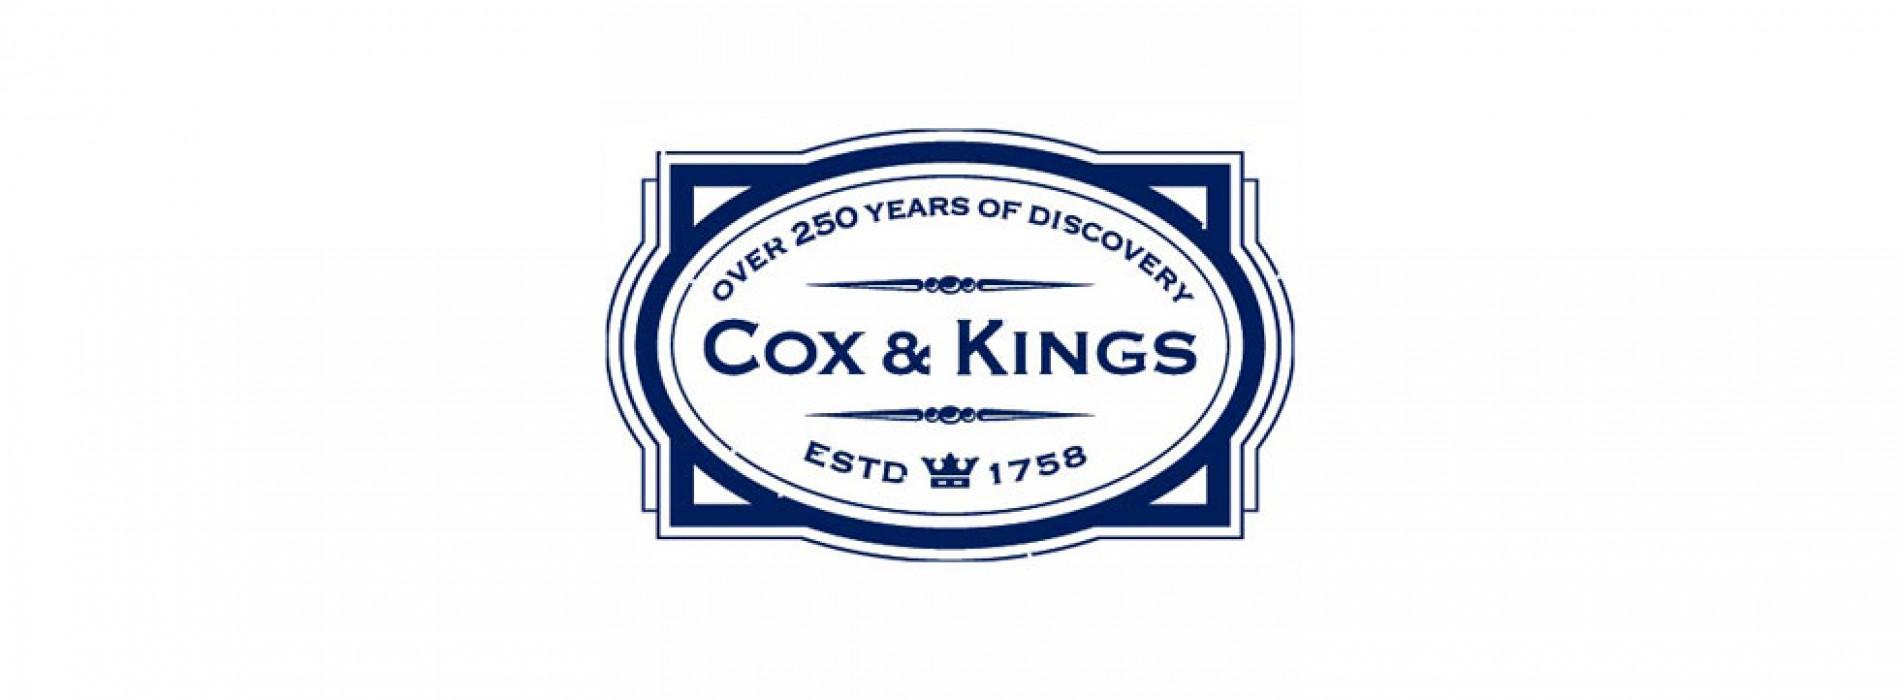 Twitter buzzing with Cox & Kings' #GetawayGoddess